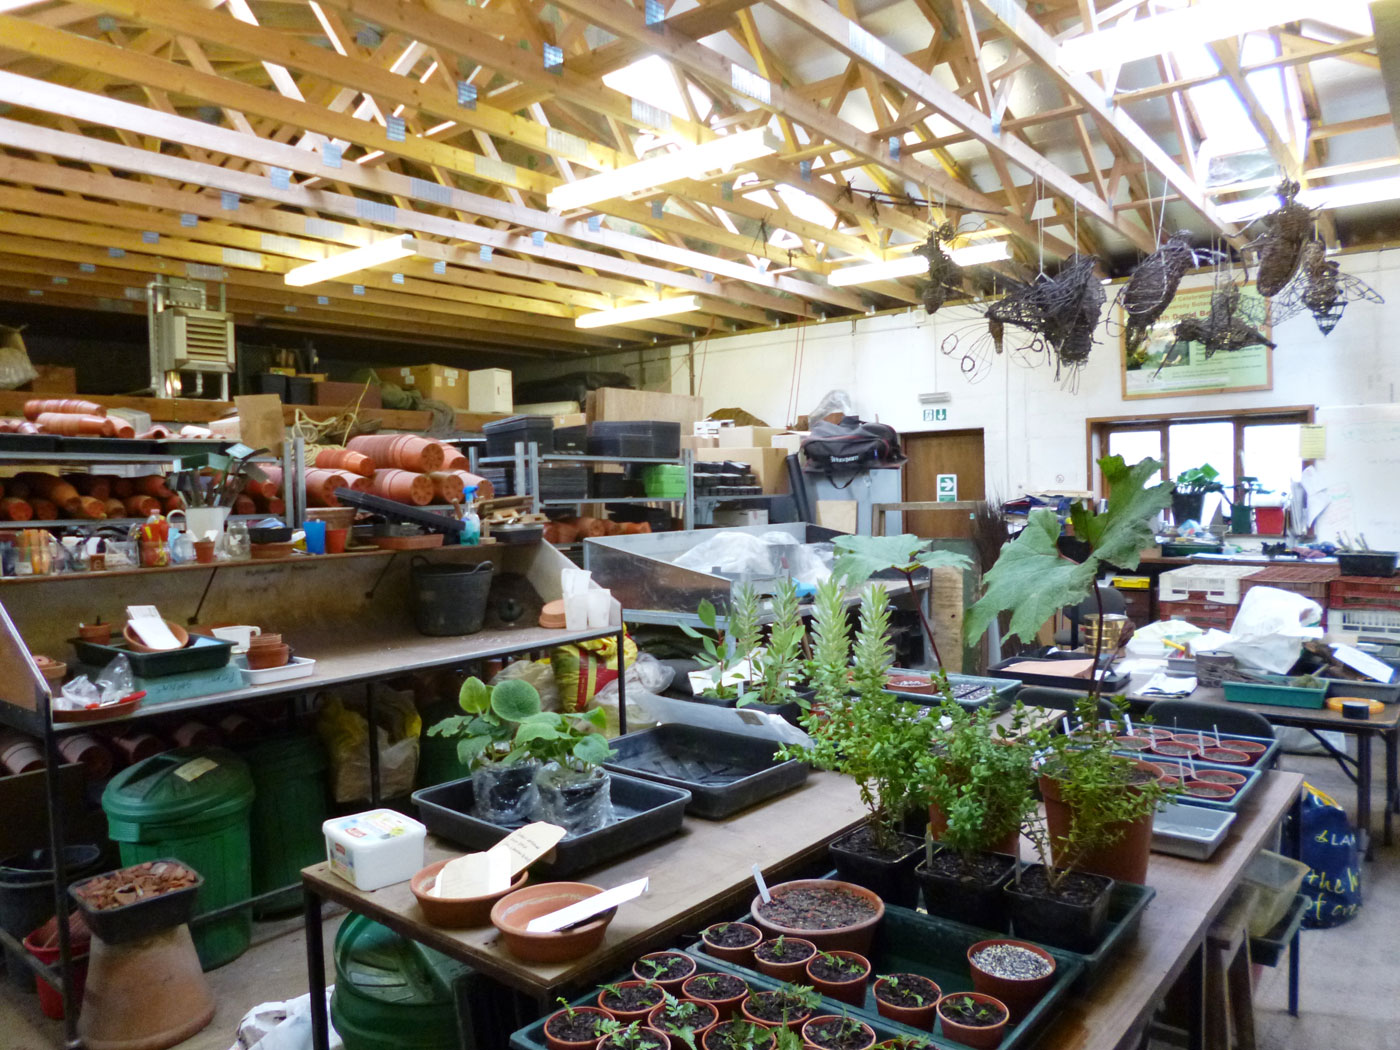 The potting shed at the University of Bristol Botanic Gardens